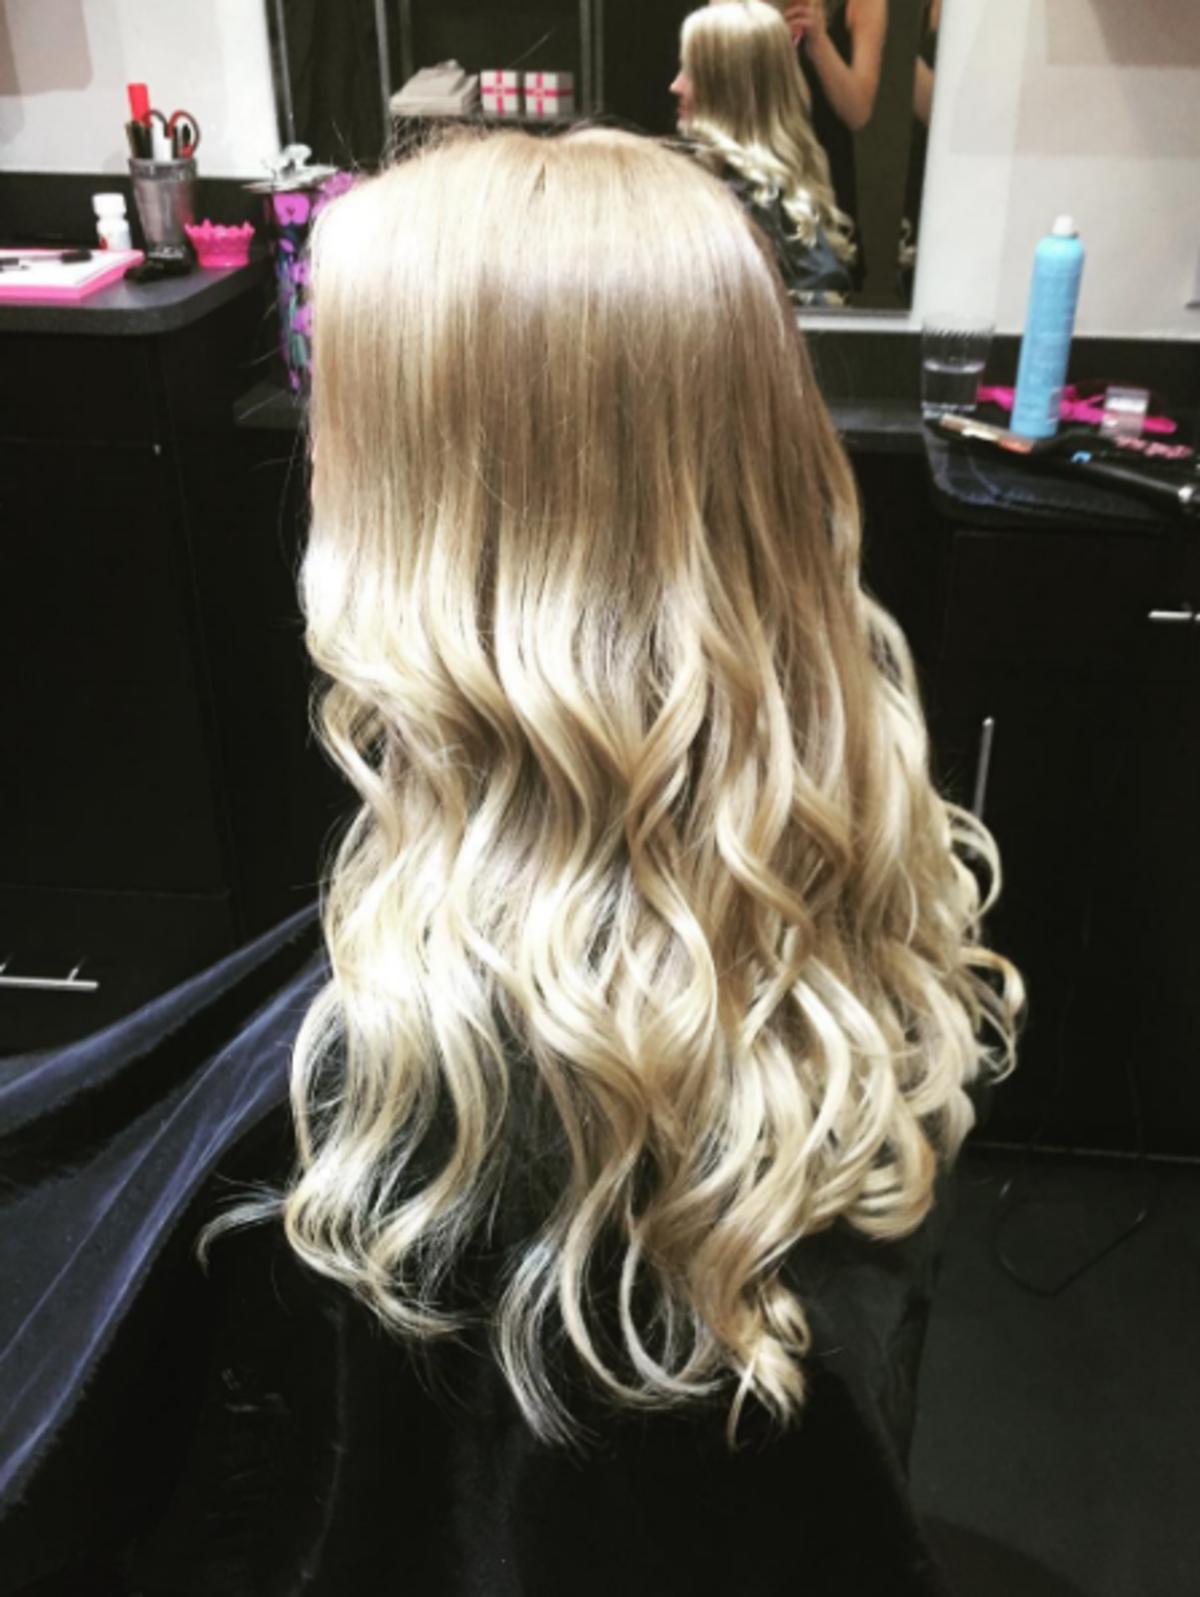 Zdjęcie: Instagram.com/blondempire